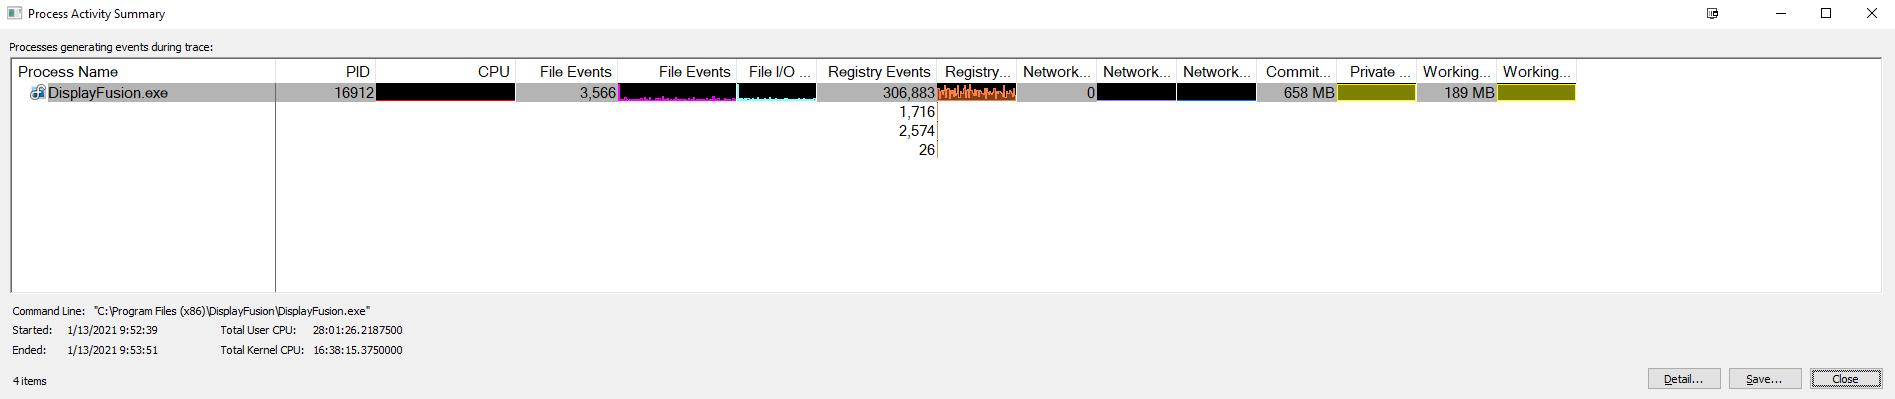 Screenshot 2021-01-13 100823.png